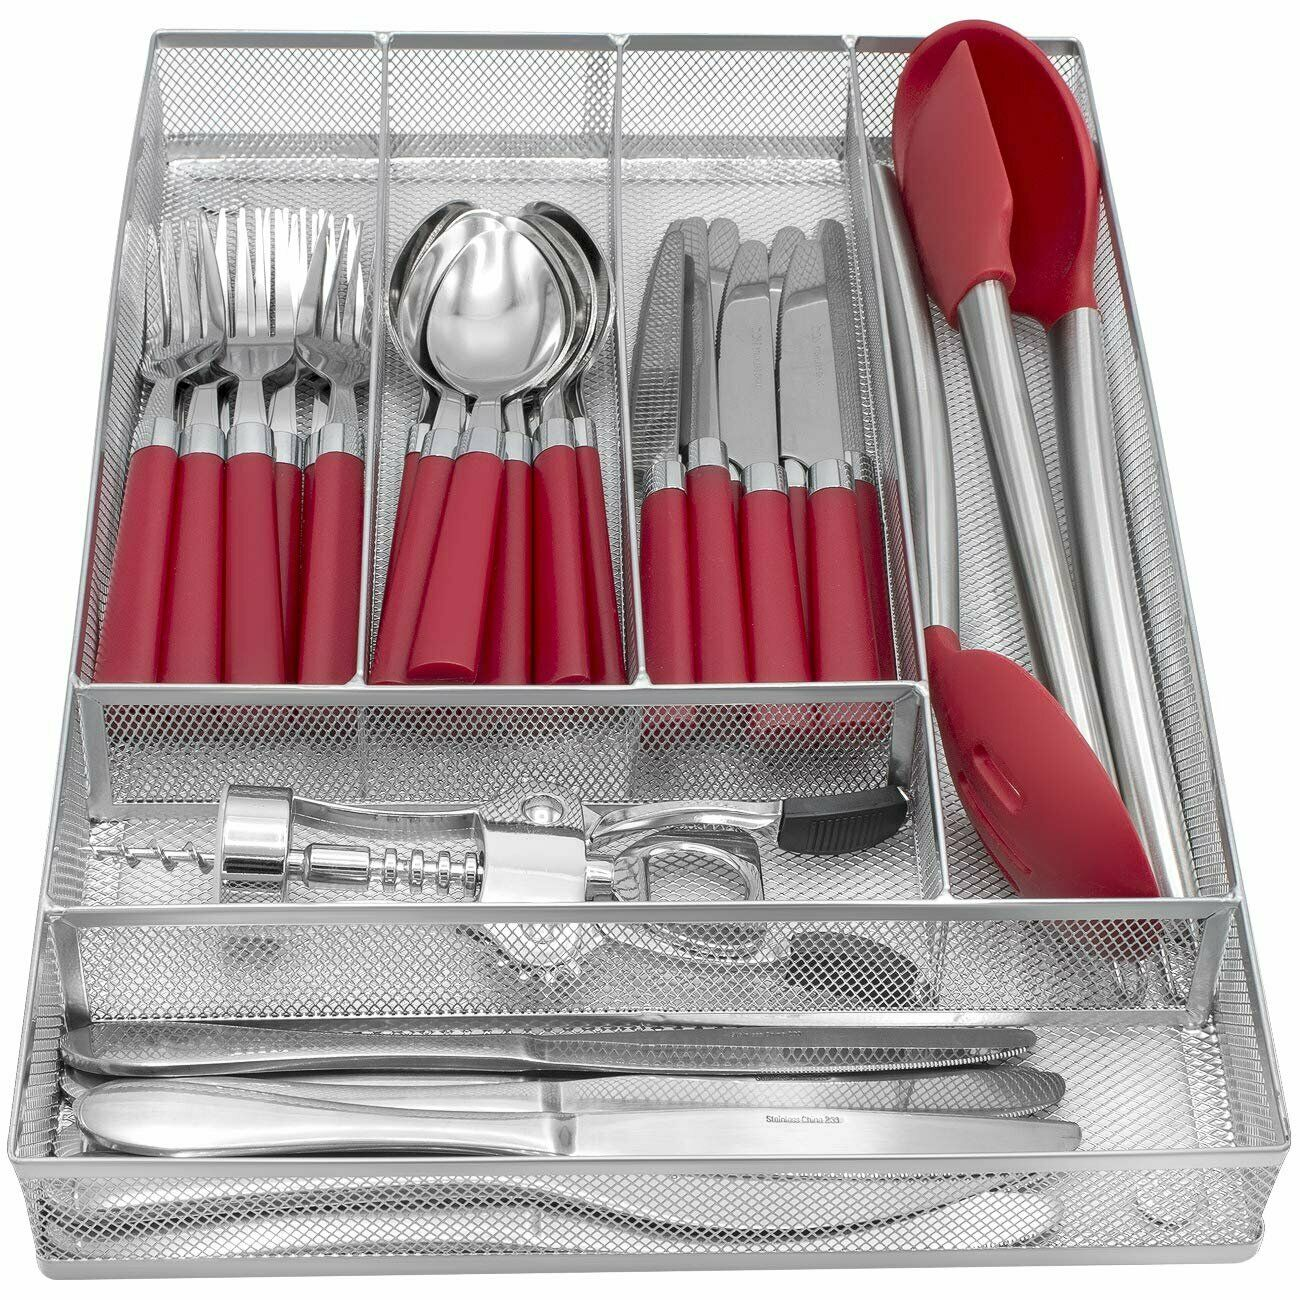 Expandable Cutlery Flatware Drawer Utensil Tray Kitchen Organizer Storage Holder